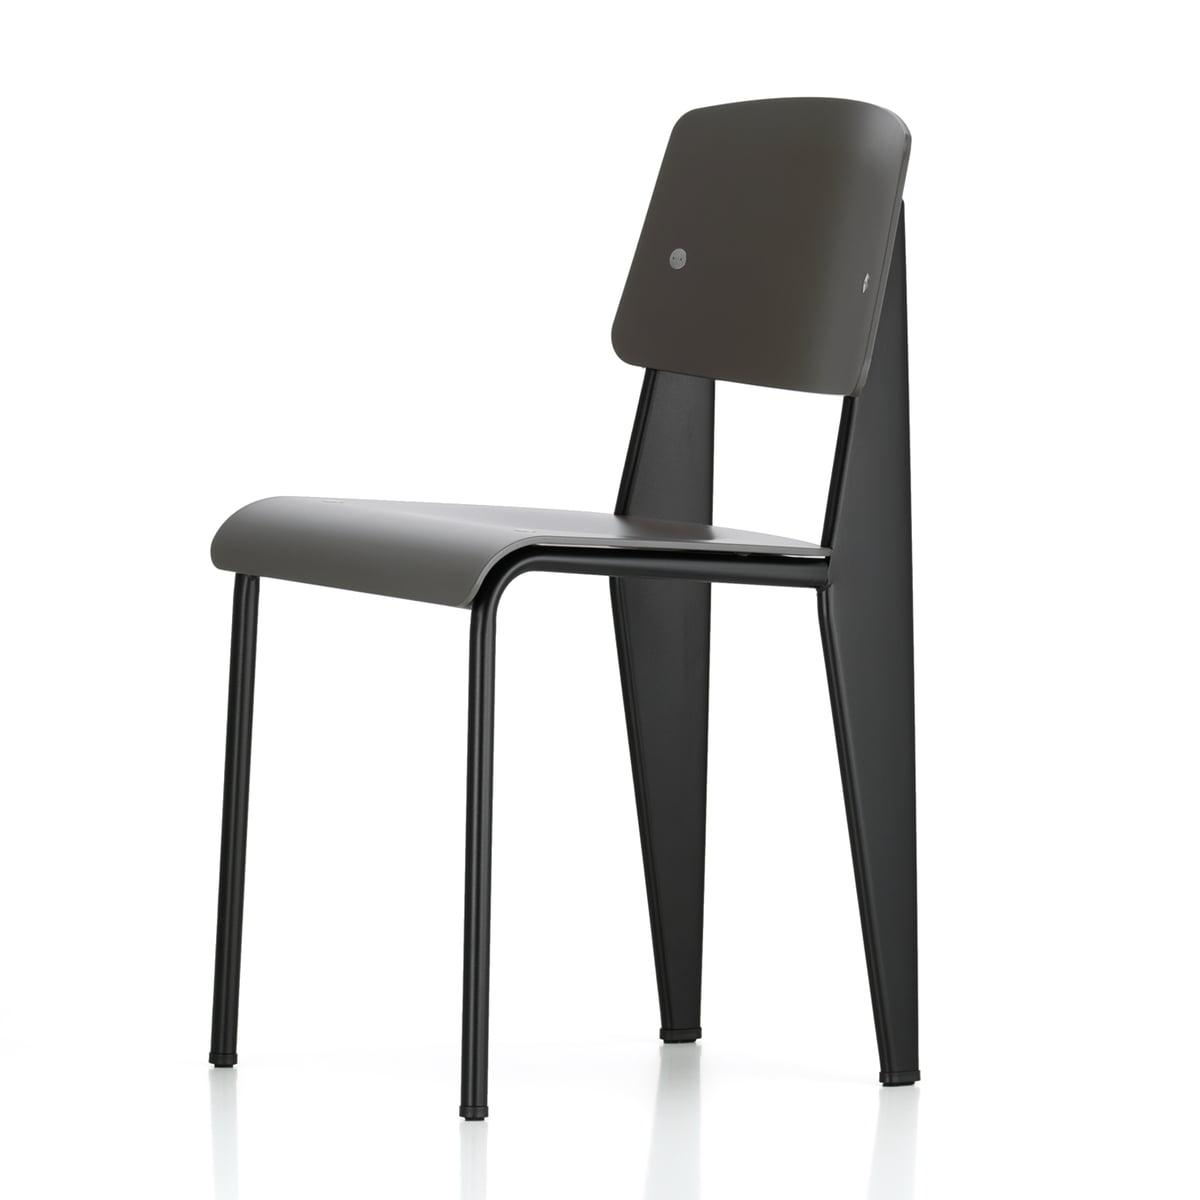 prouv standard sp chair par vitra. Black Bedroom Furniture Sets. Home Design Ideas